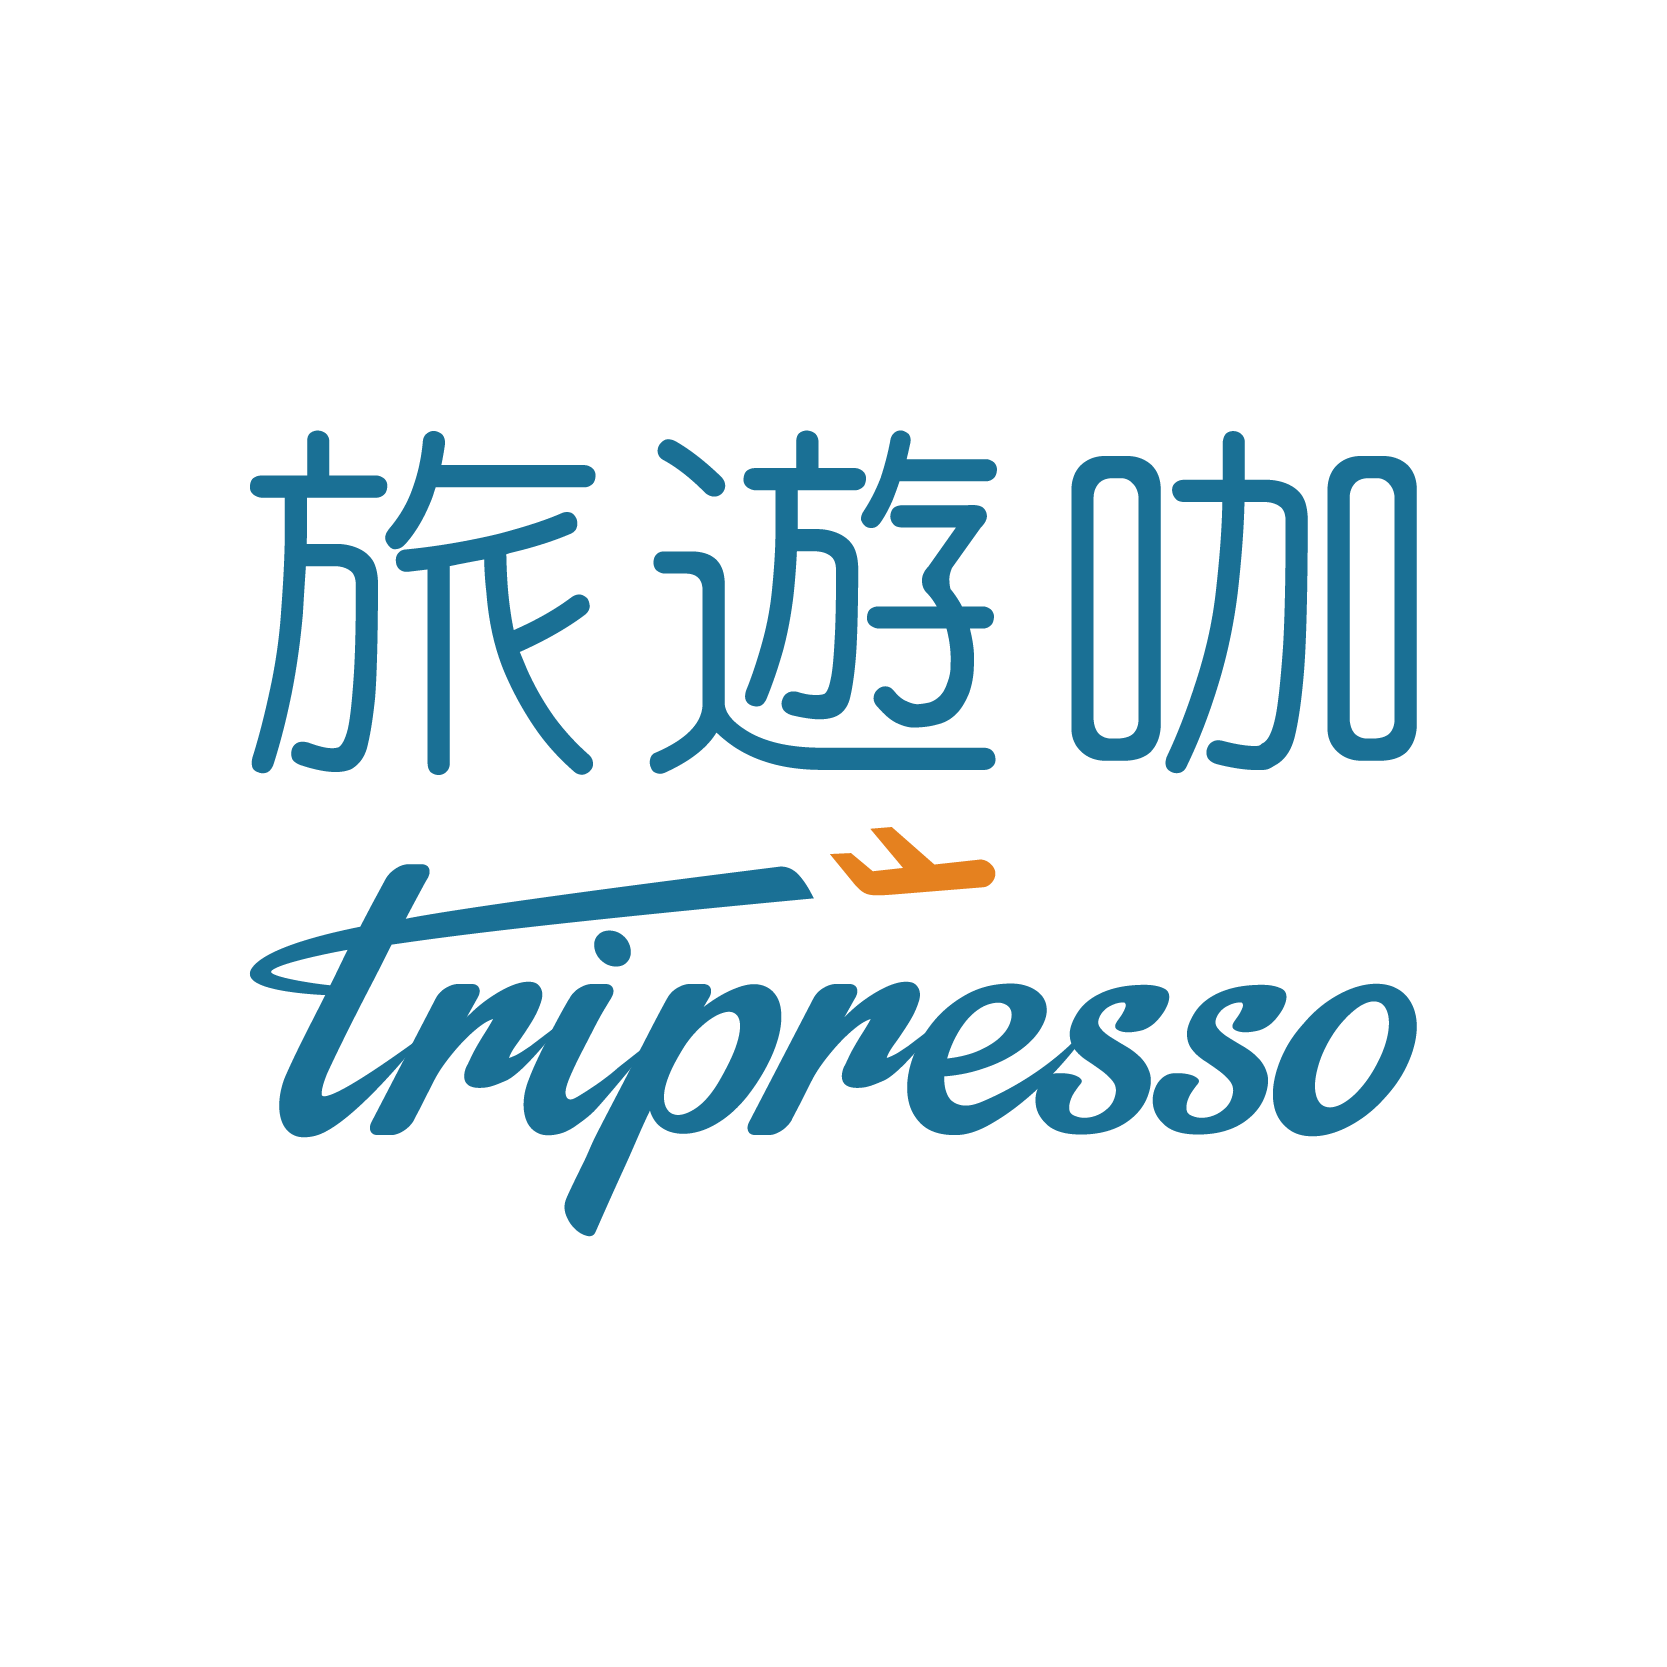 【Tripresso旅遊咖】告訴你暑假怎麼玩最好玩,一起Fun瘋趣!